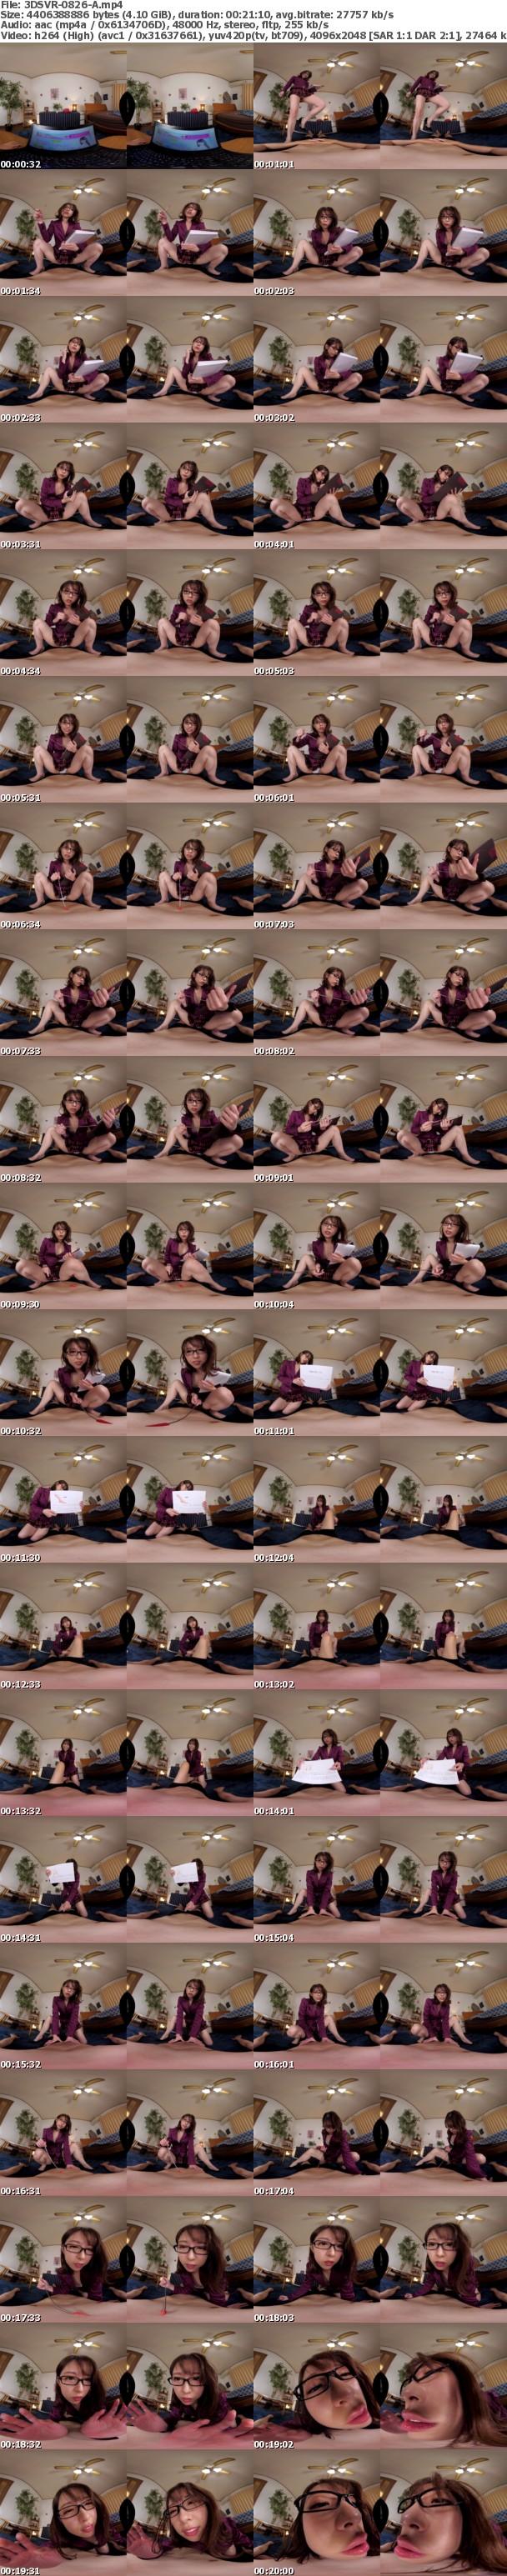 (VR) 3DSVR-0826 早漏改善 射精コントロール カウントダウン射精 痴女系騎乗位チントレ射精管理SEX